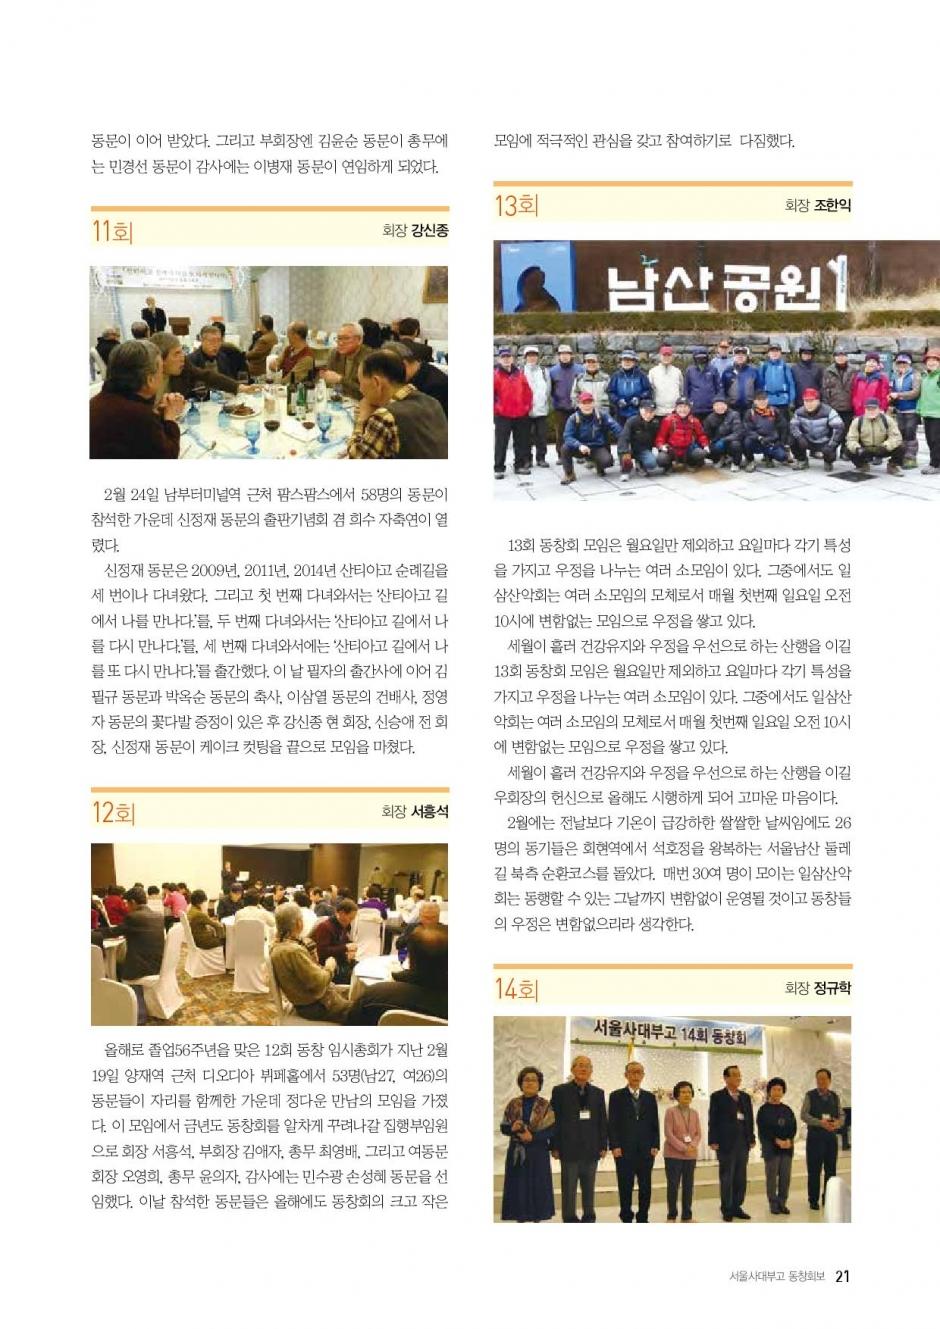 snubugo_98-page-021.jpg